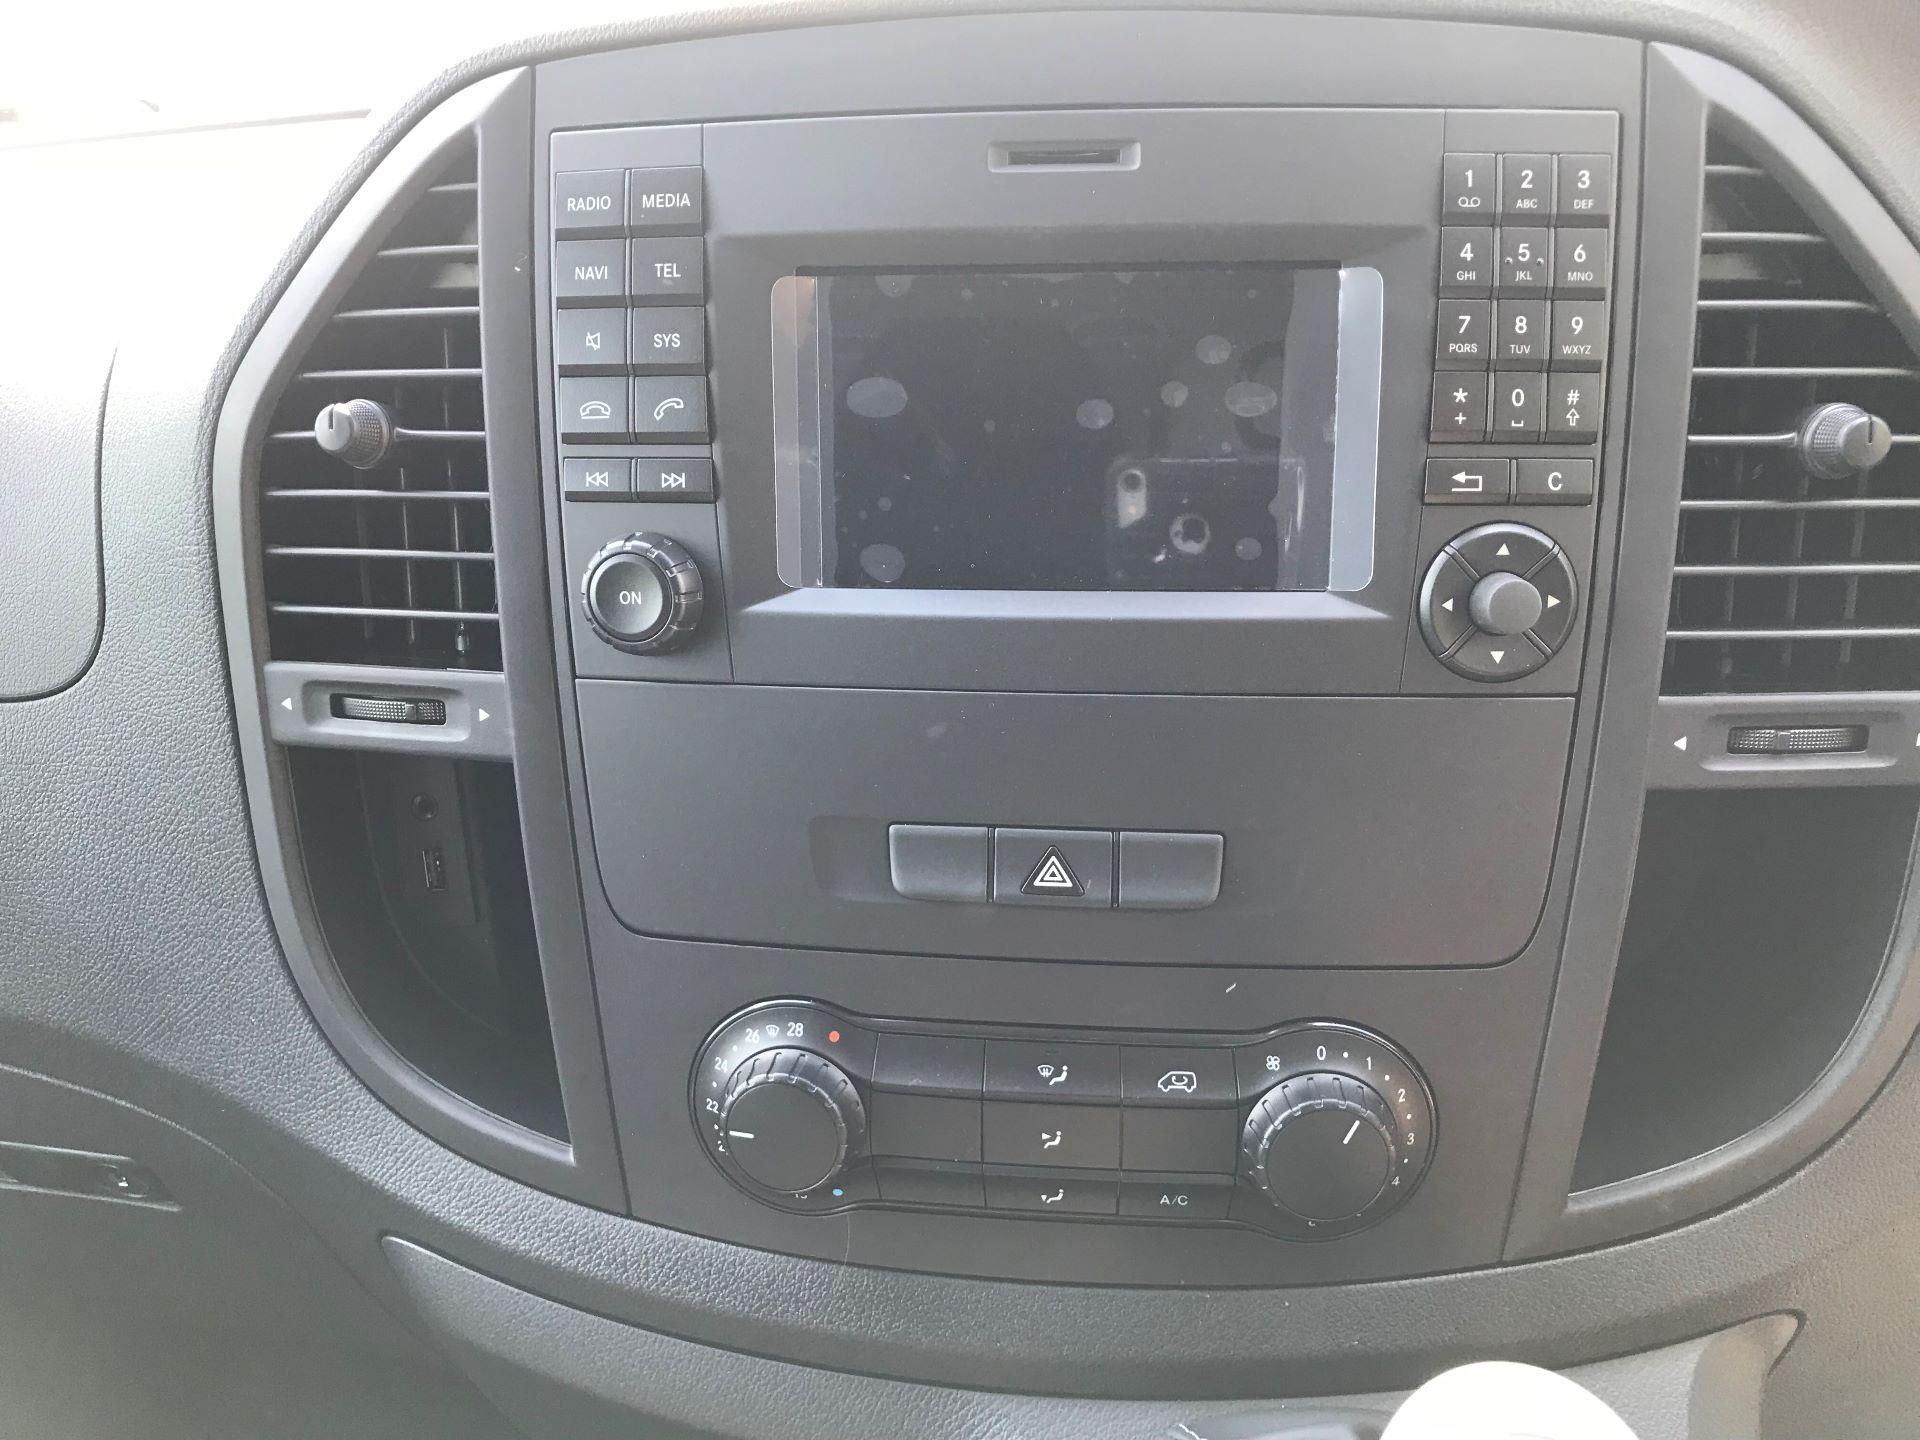 2019 Mercedes-Benz Vito 111Cdi Van Euro 6 Massive specification A/C (YM19FPO) Image 15